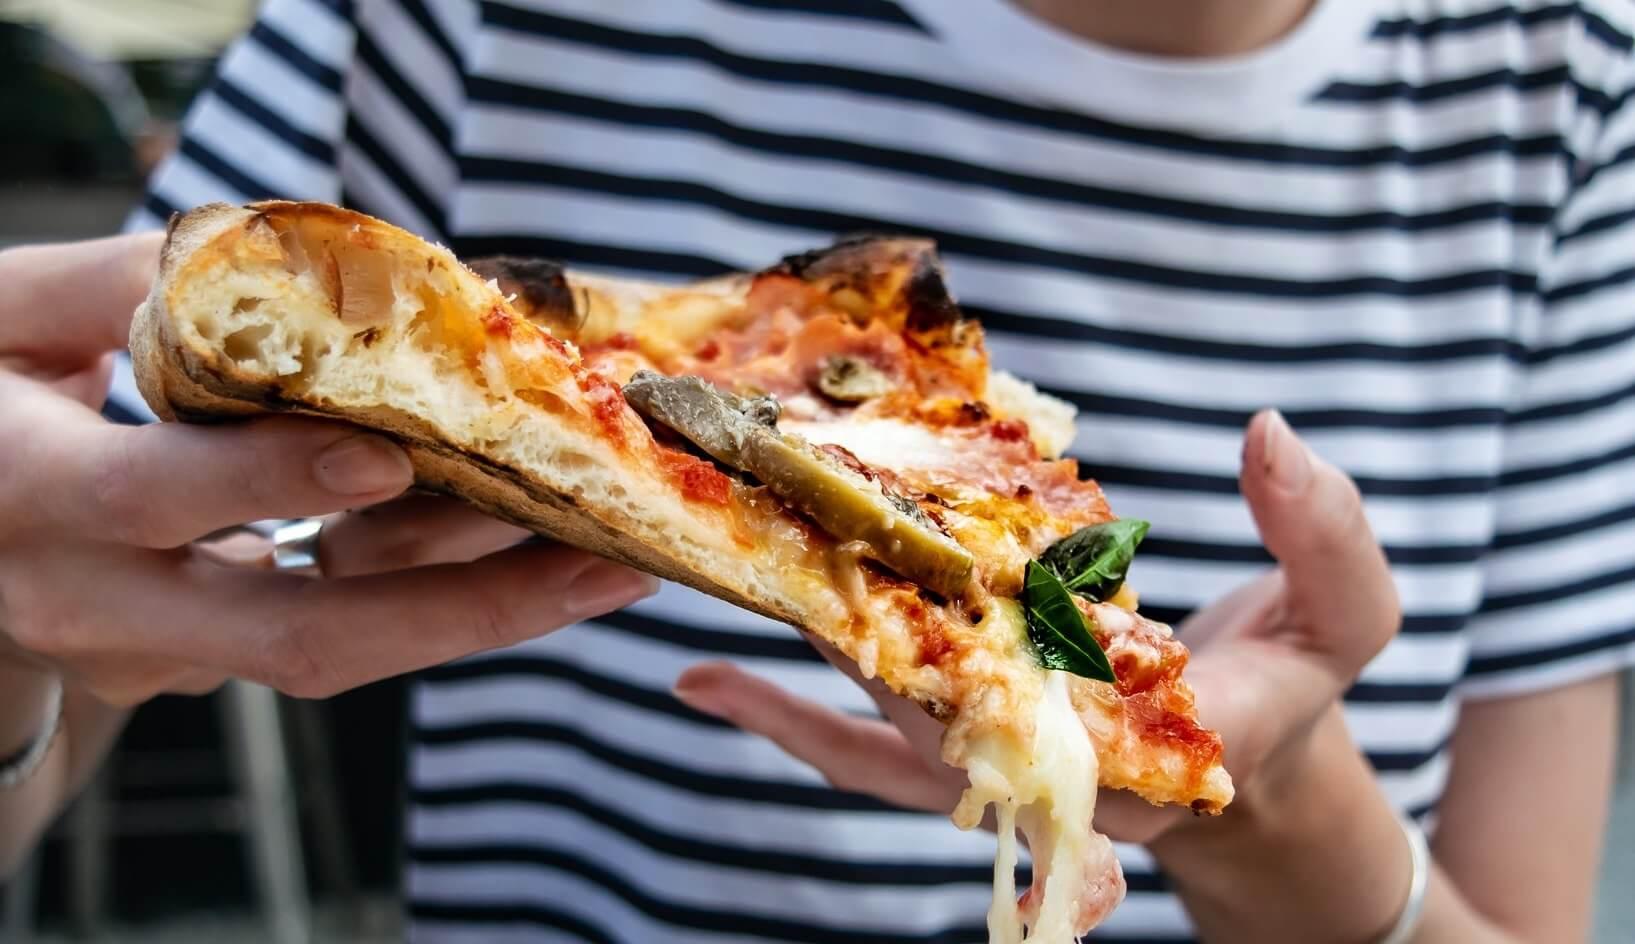 DA ANTONIO Pizzeria Napoletana